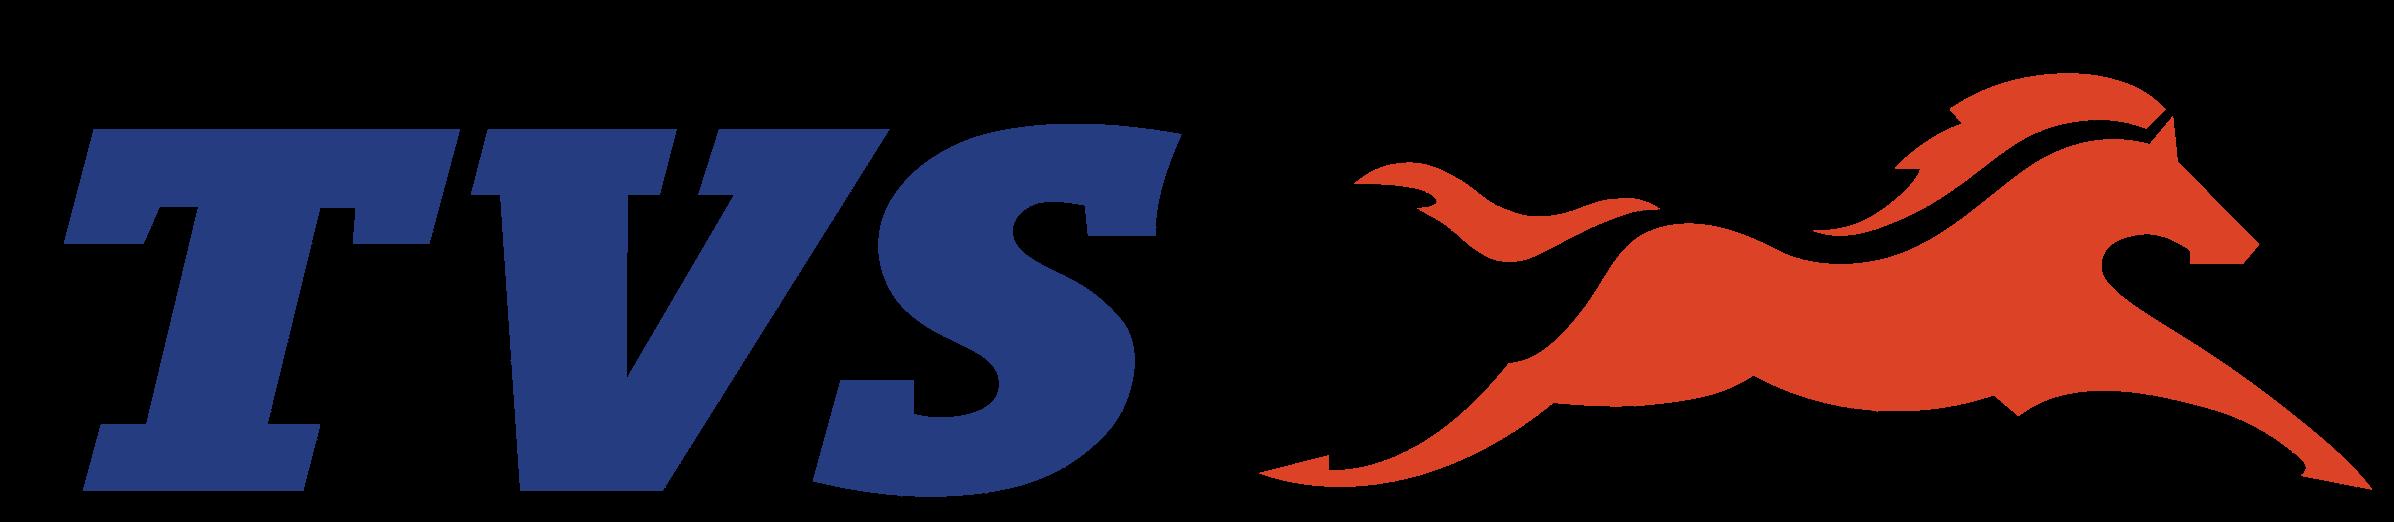 TVS_Motor_Company-Logo.wine